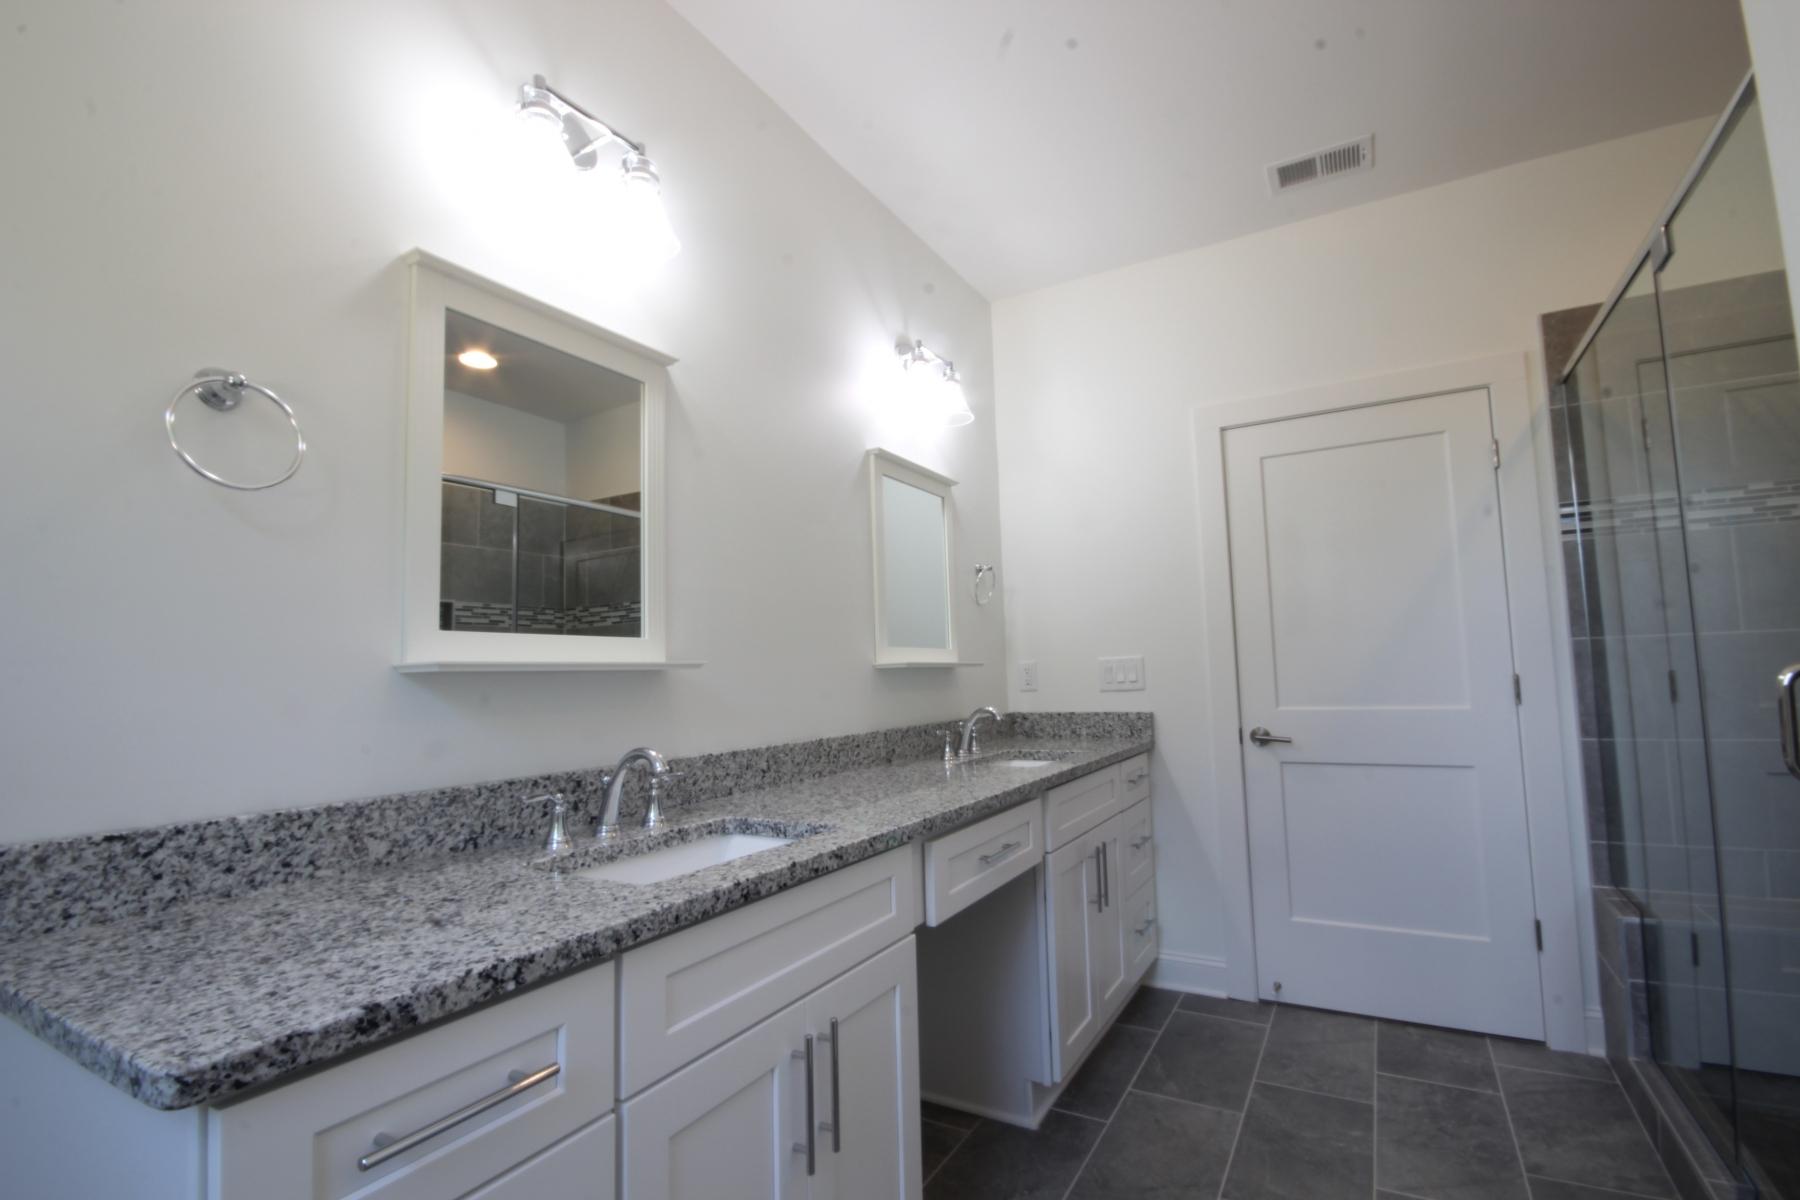 761-ss-bathroom-remodel-1